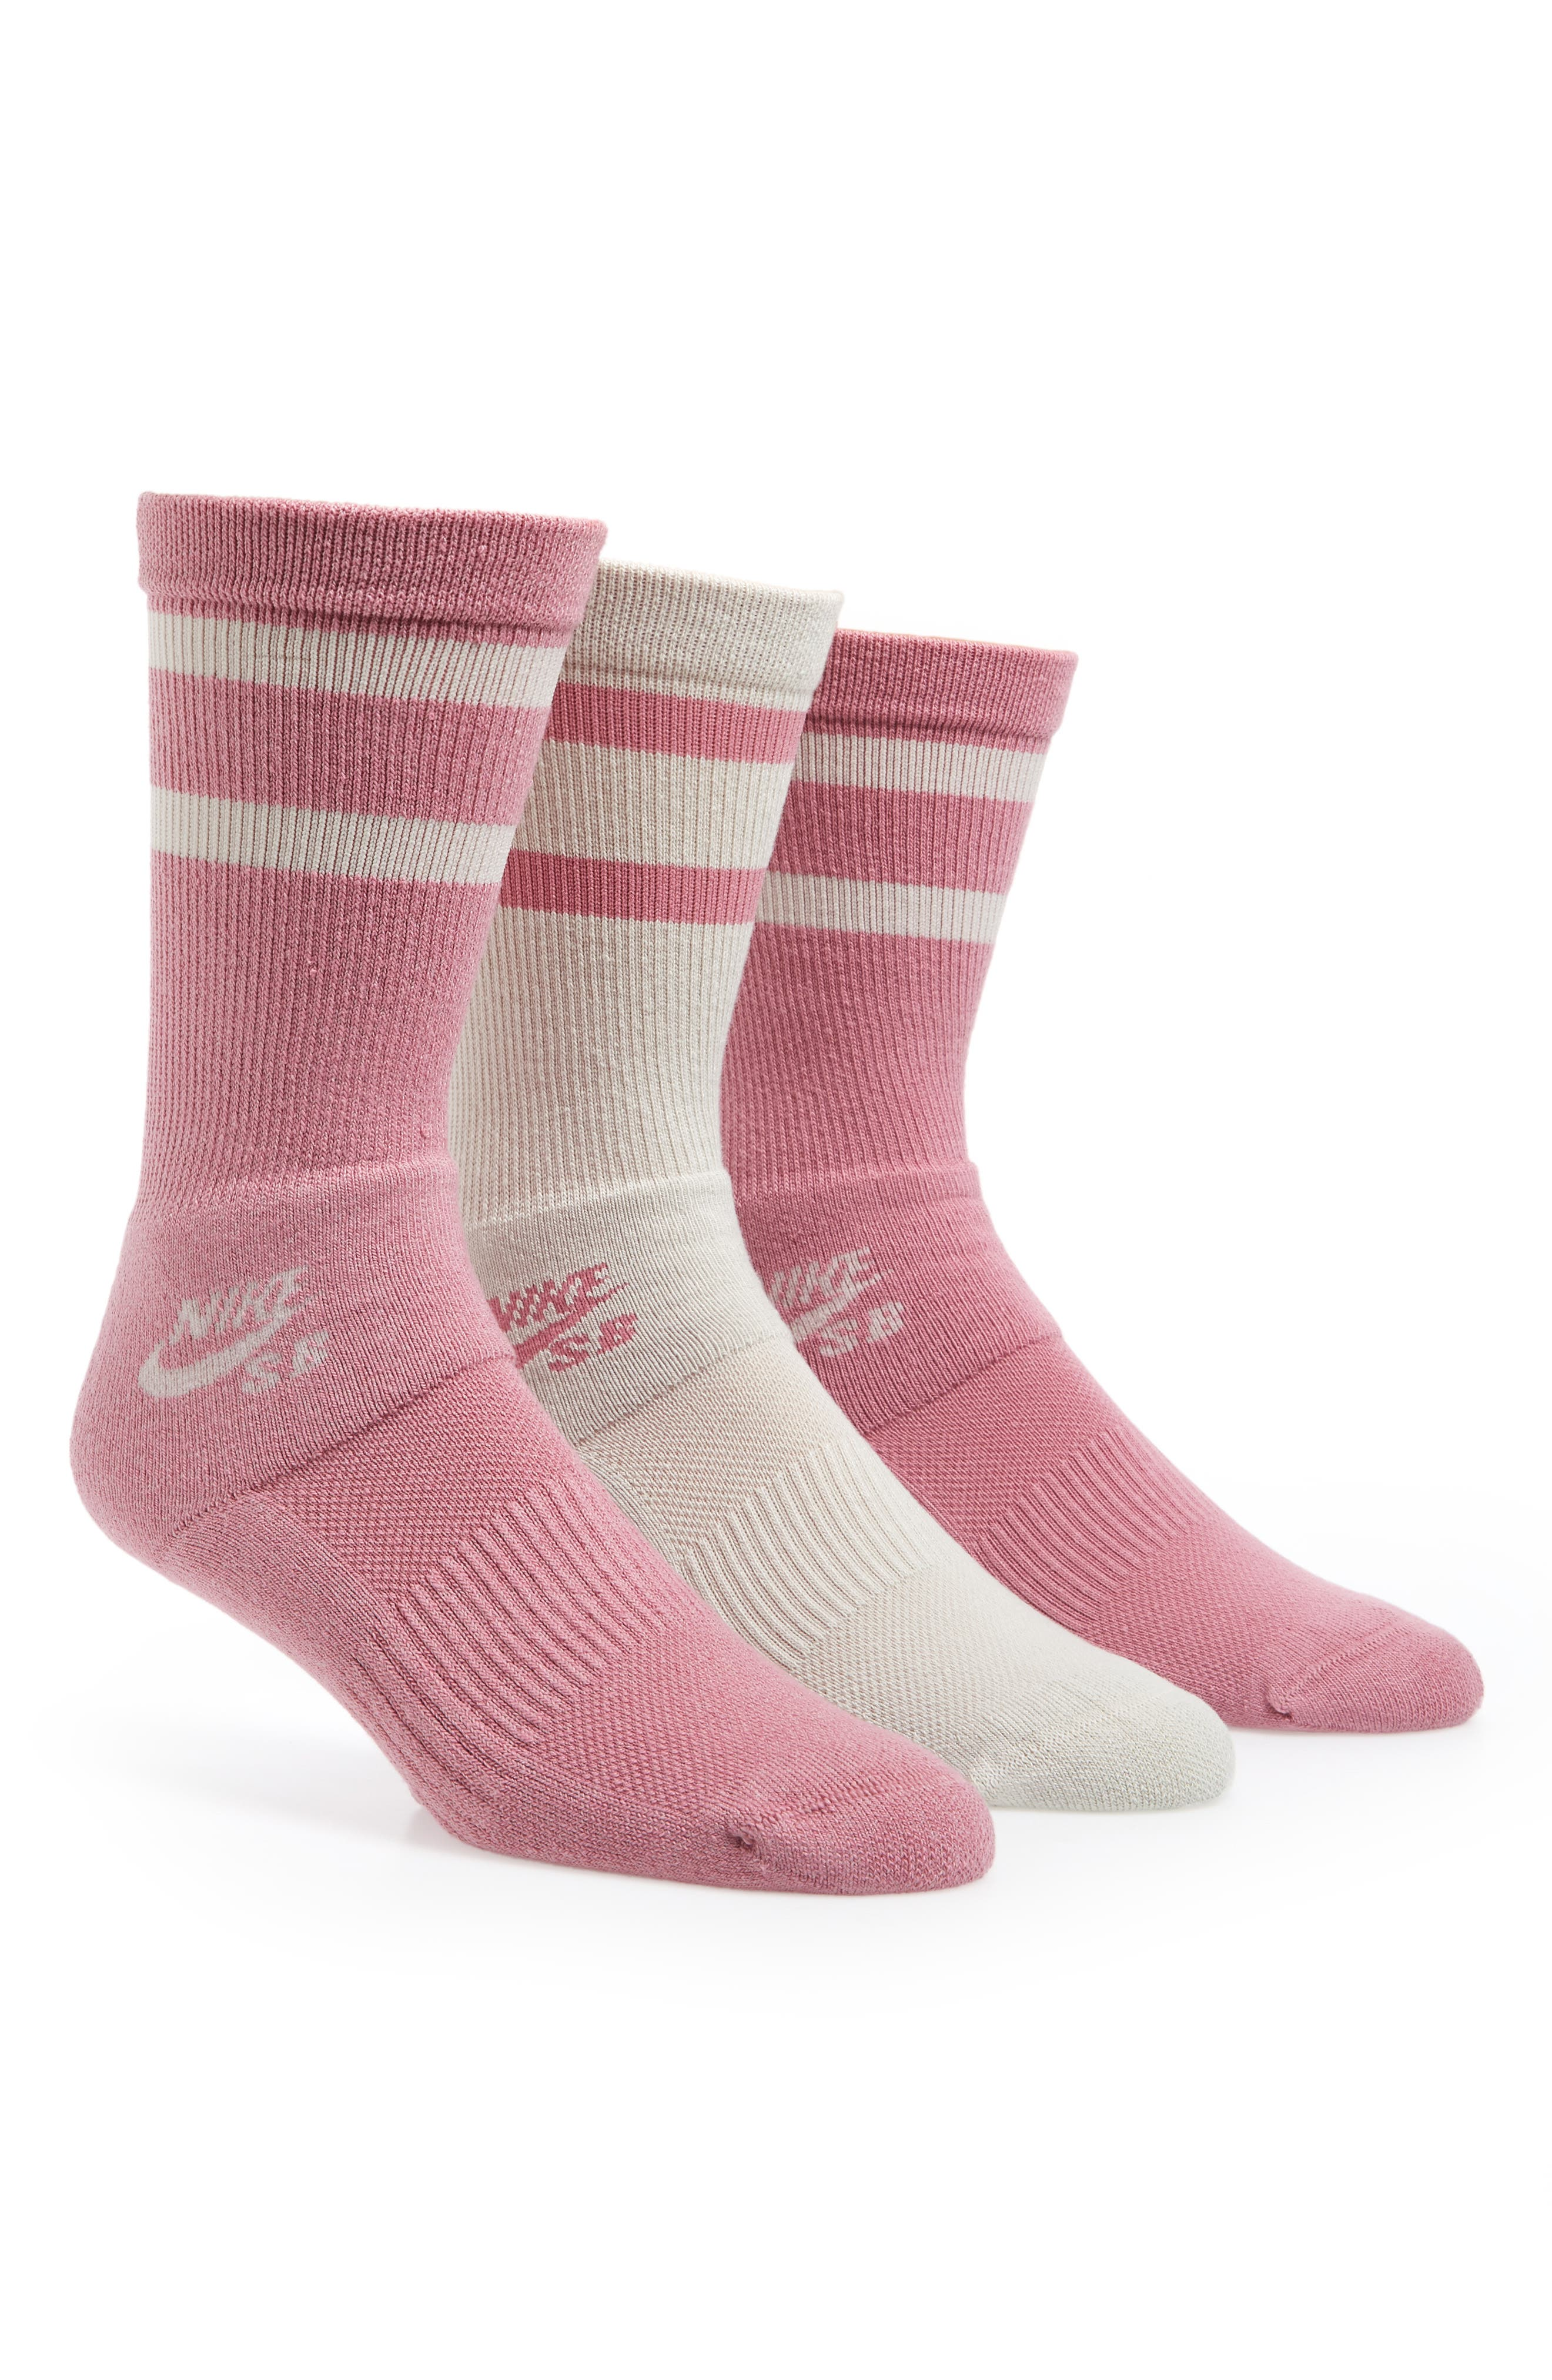 SB 3-Pack Crew Socks,                             Main thumbnail 1, color,                             Pink